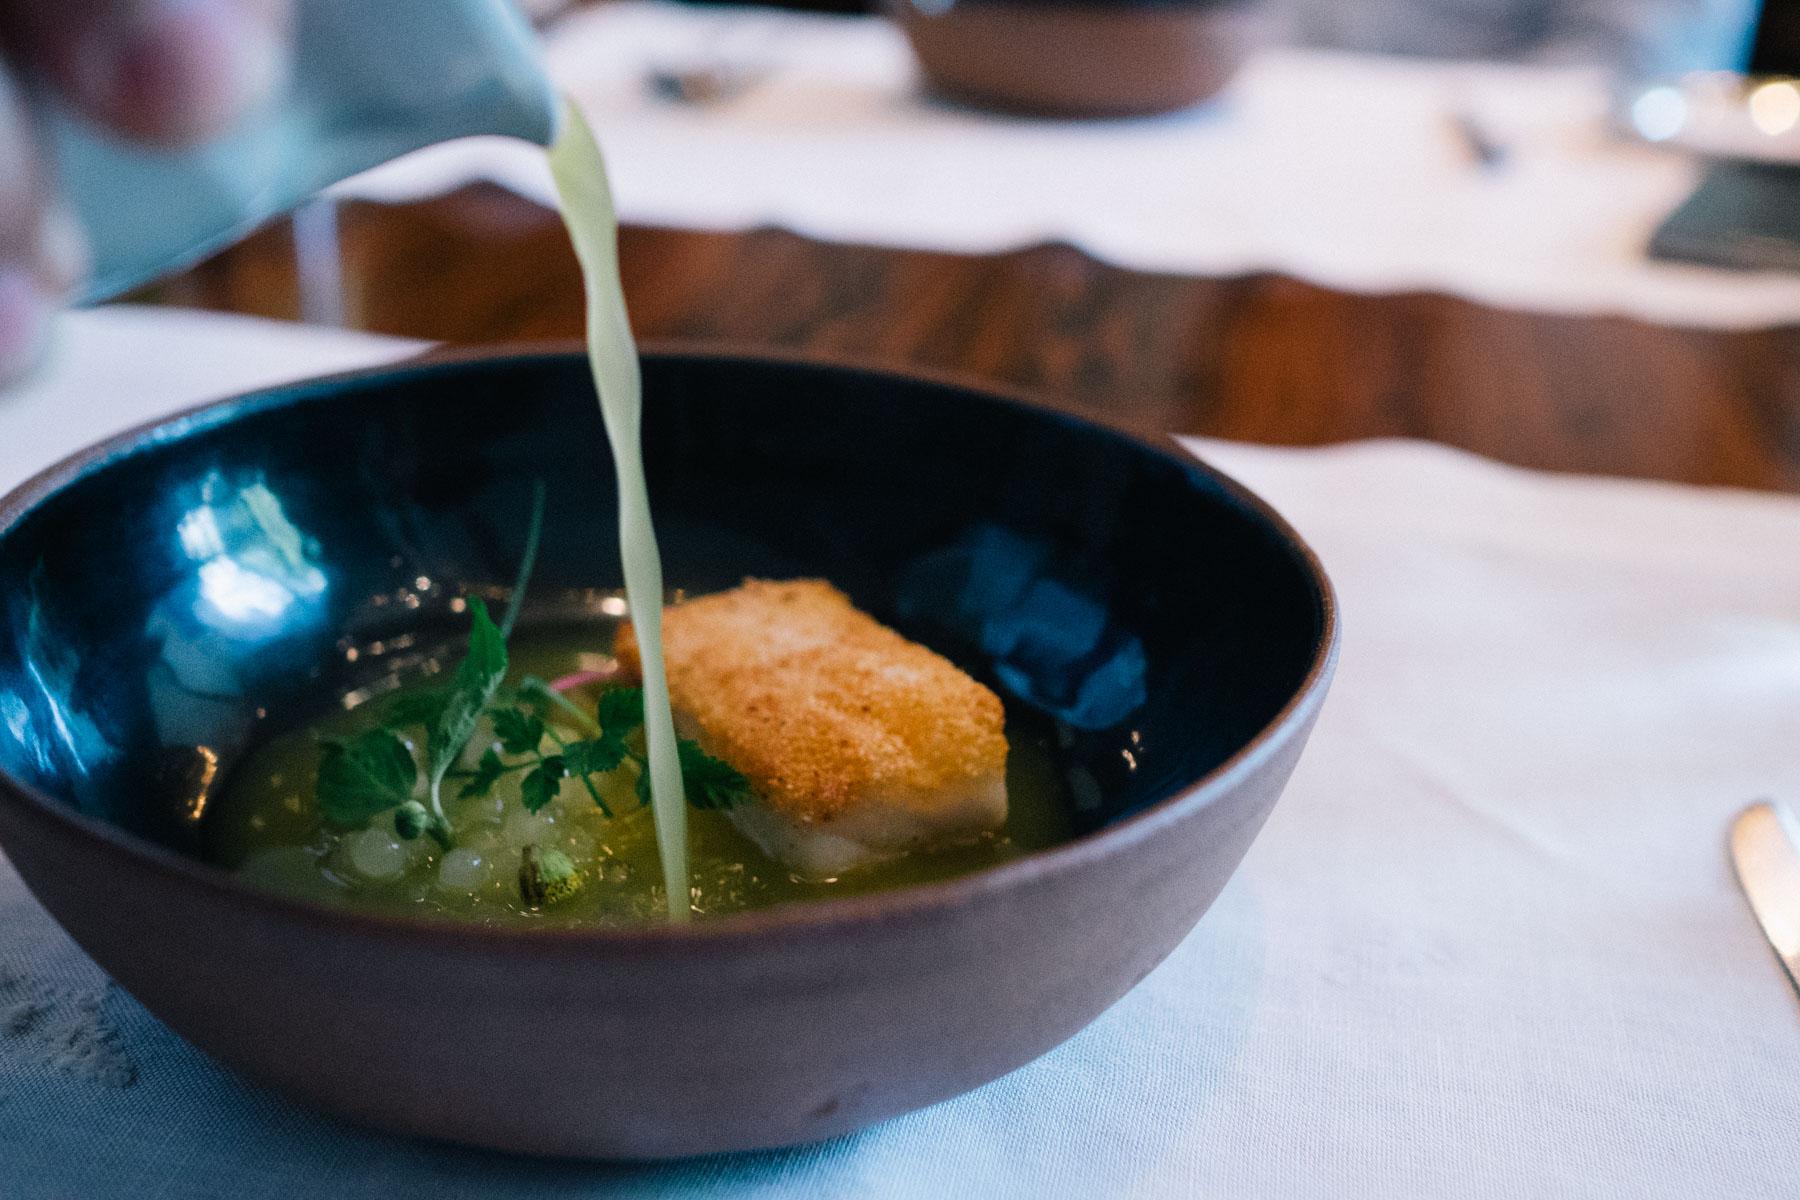 sao-paulo-worlds-best-restaurant-dom-brazil-brasil-michelin-star-11